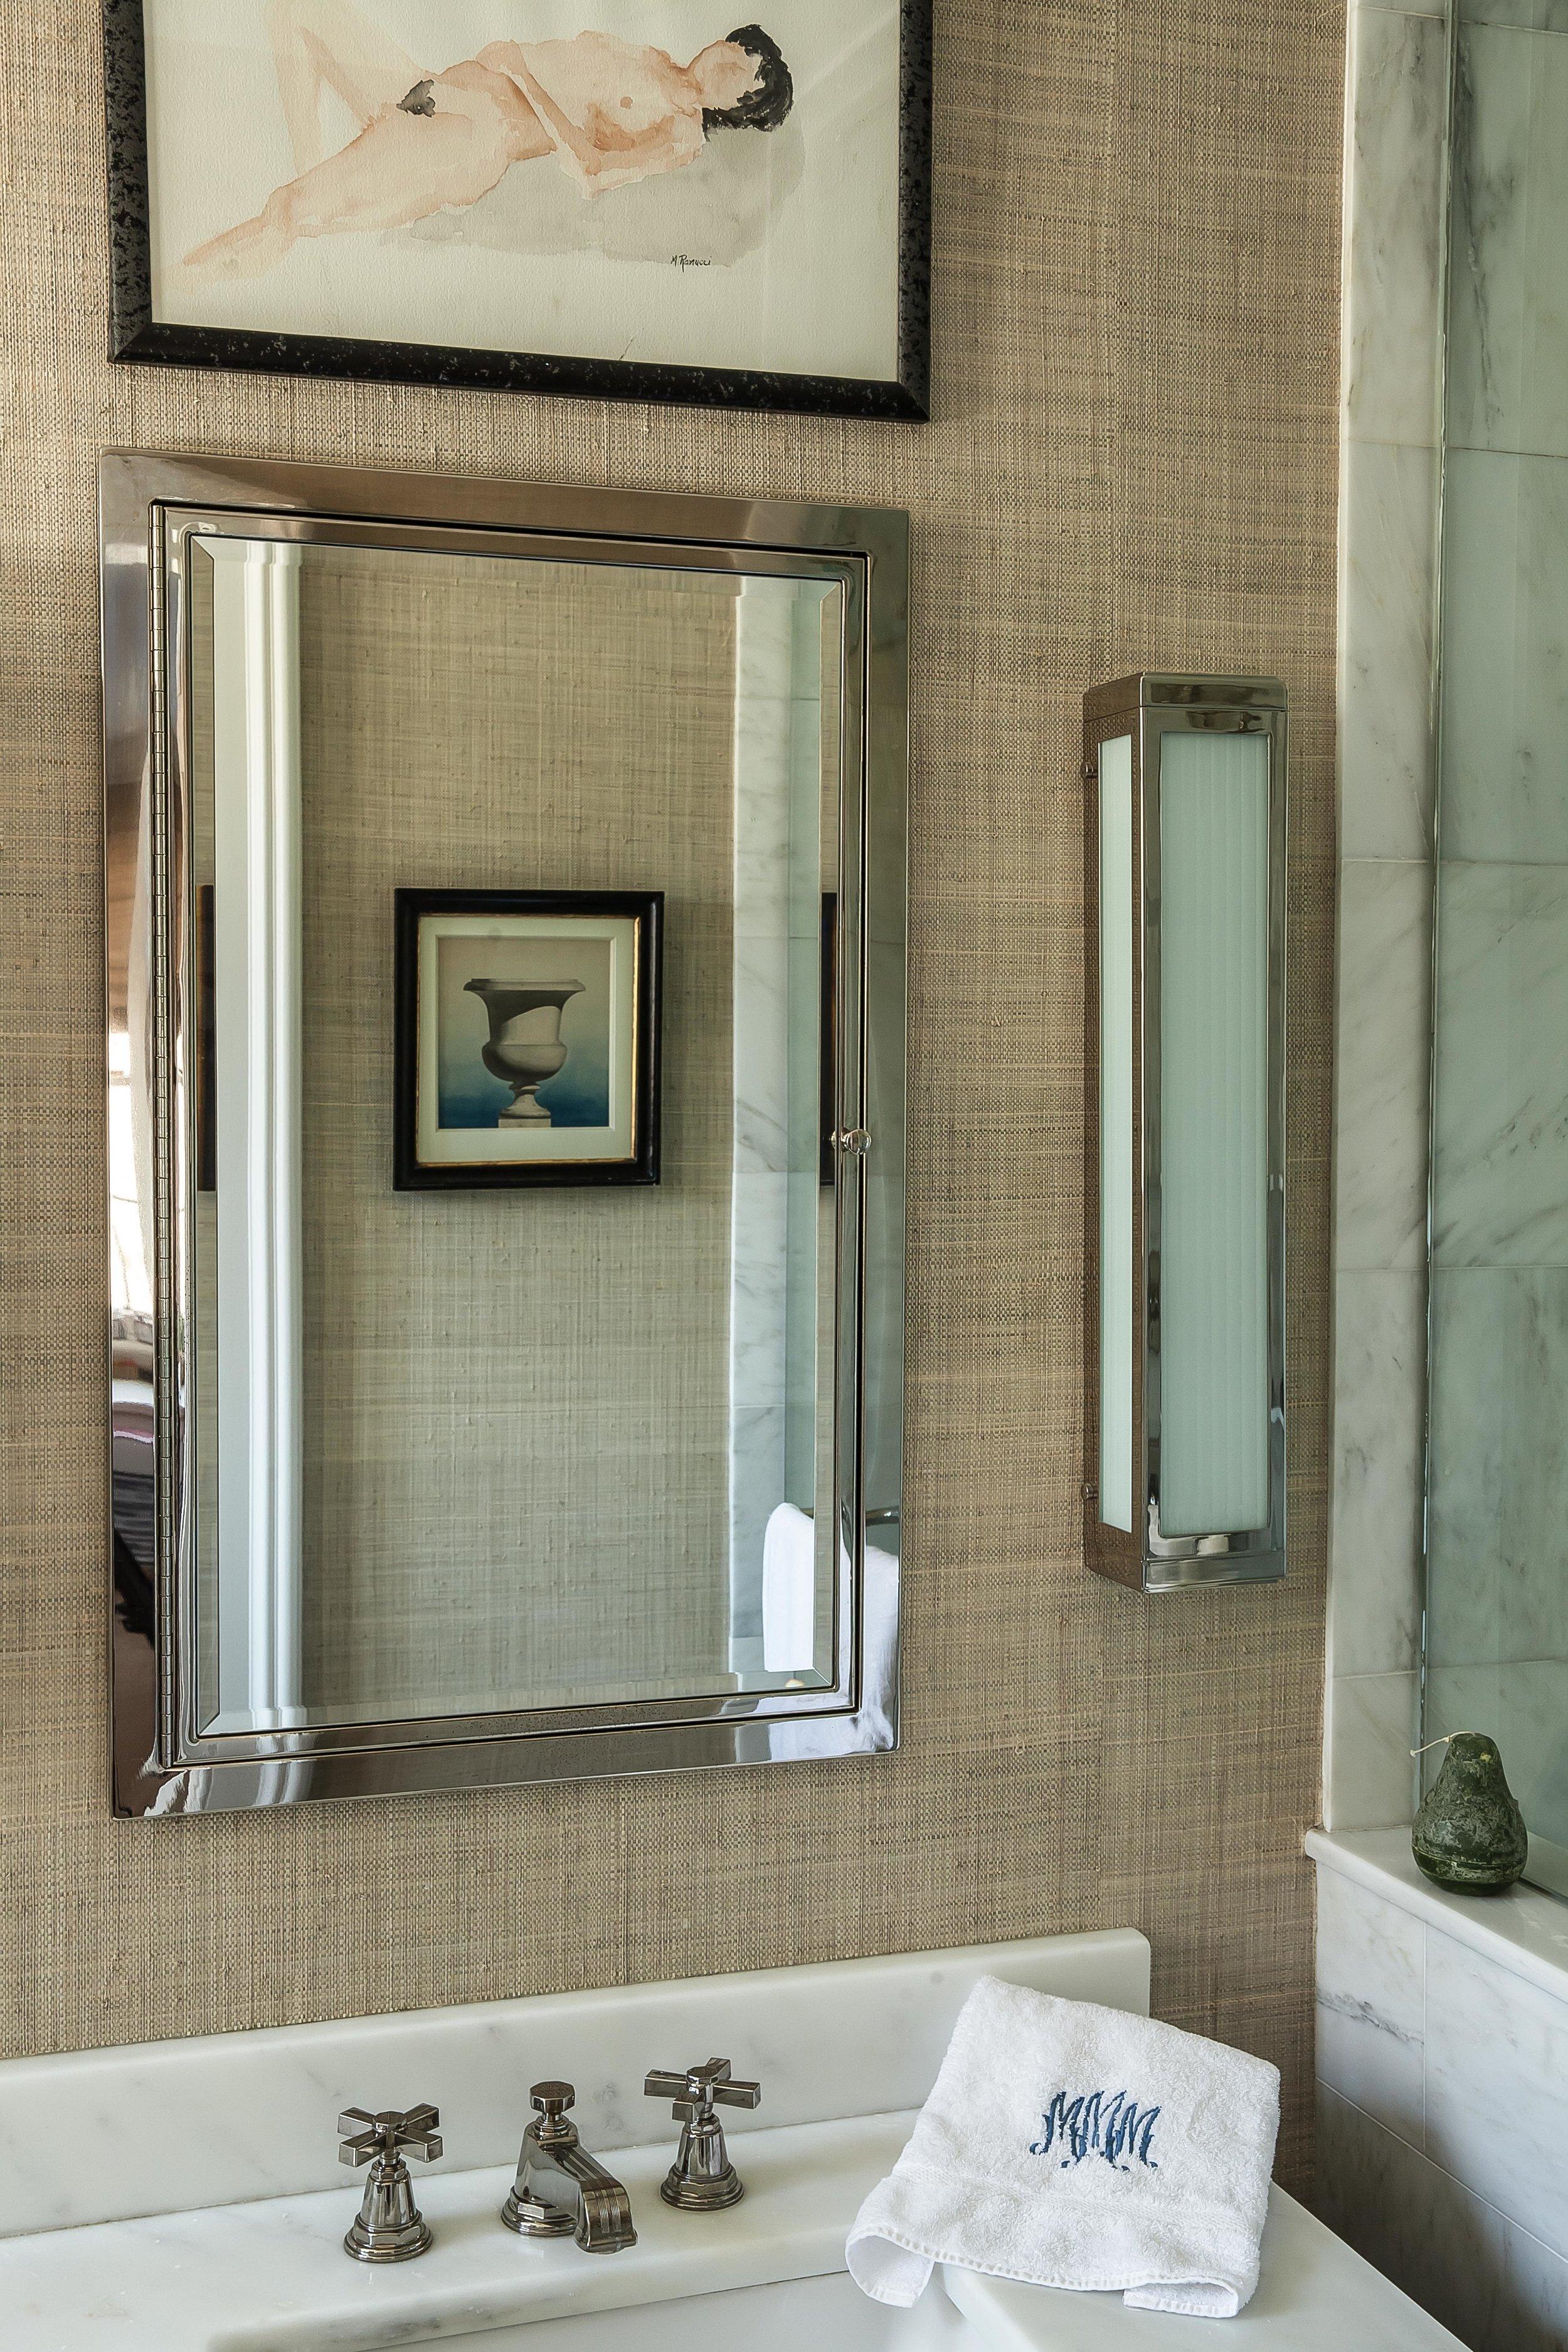 Bath.mirror.jpg